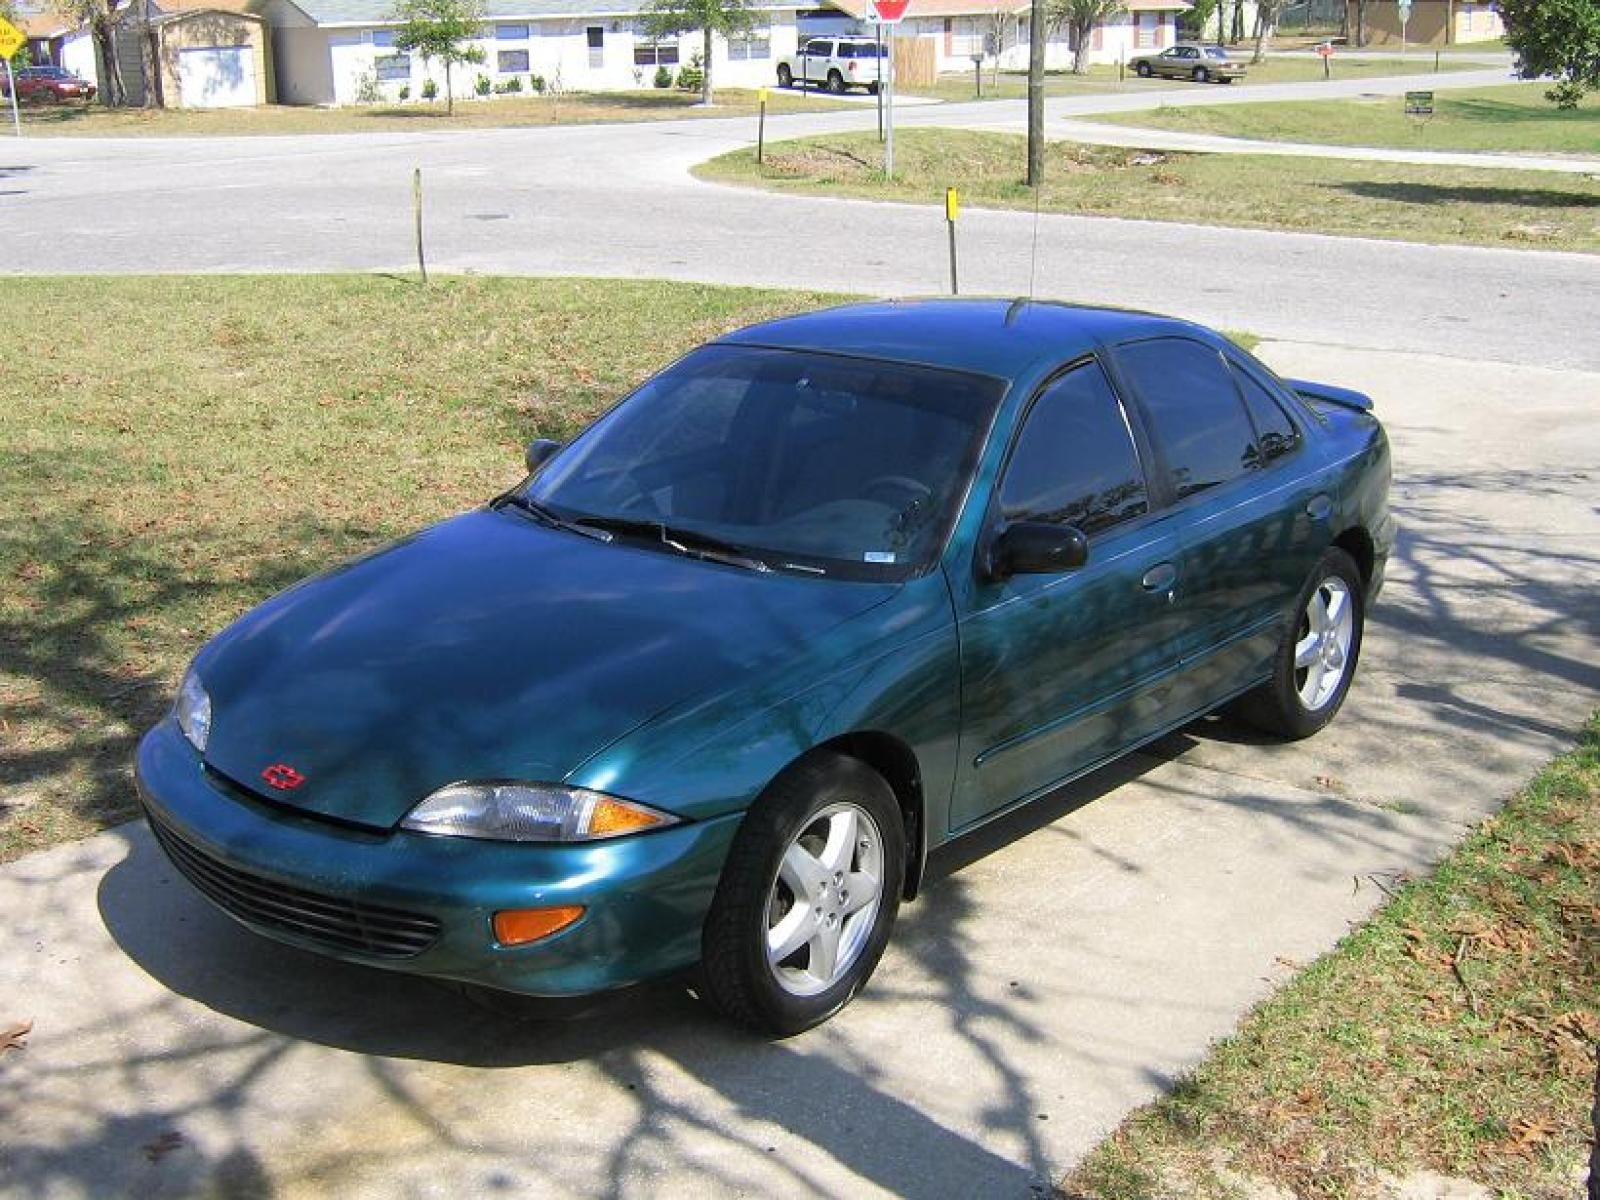 1996 Chevrolet Cavalier 7 800 1024 1280 1600 Origin